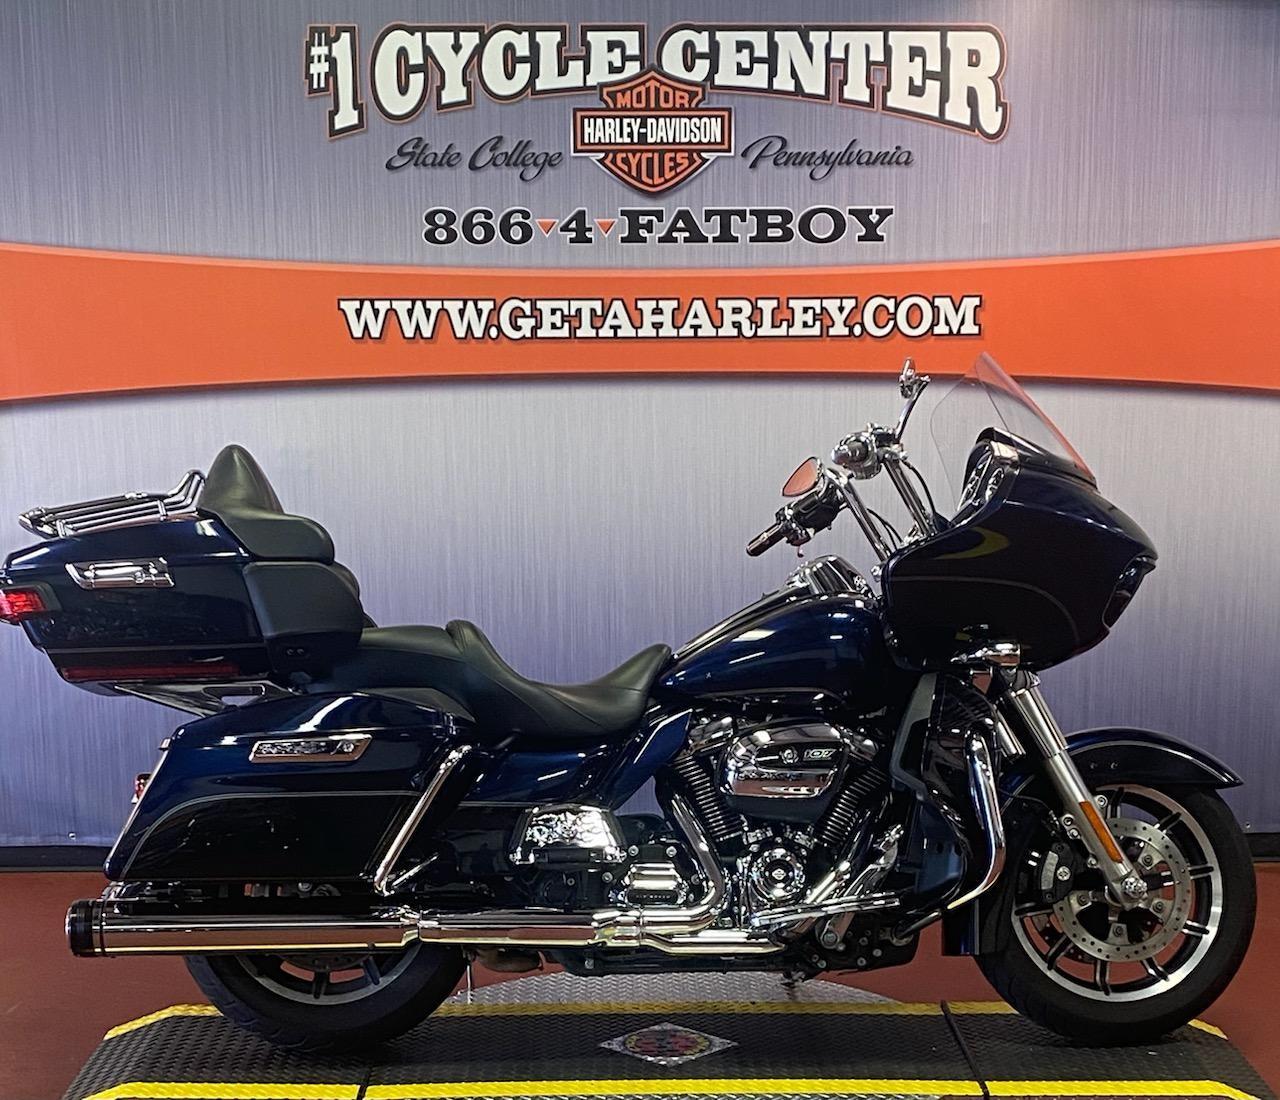 2018 Harley-Davidson Road Glide Ultra at #1 Cycle Center Harley-Davidson